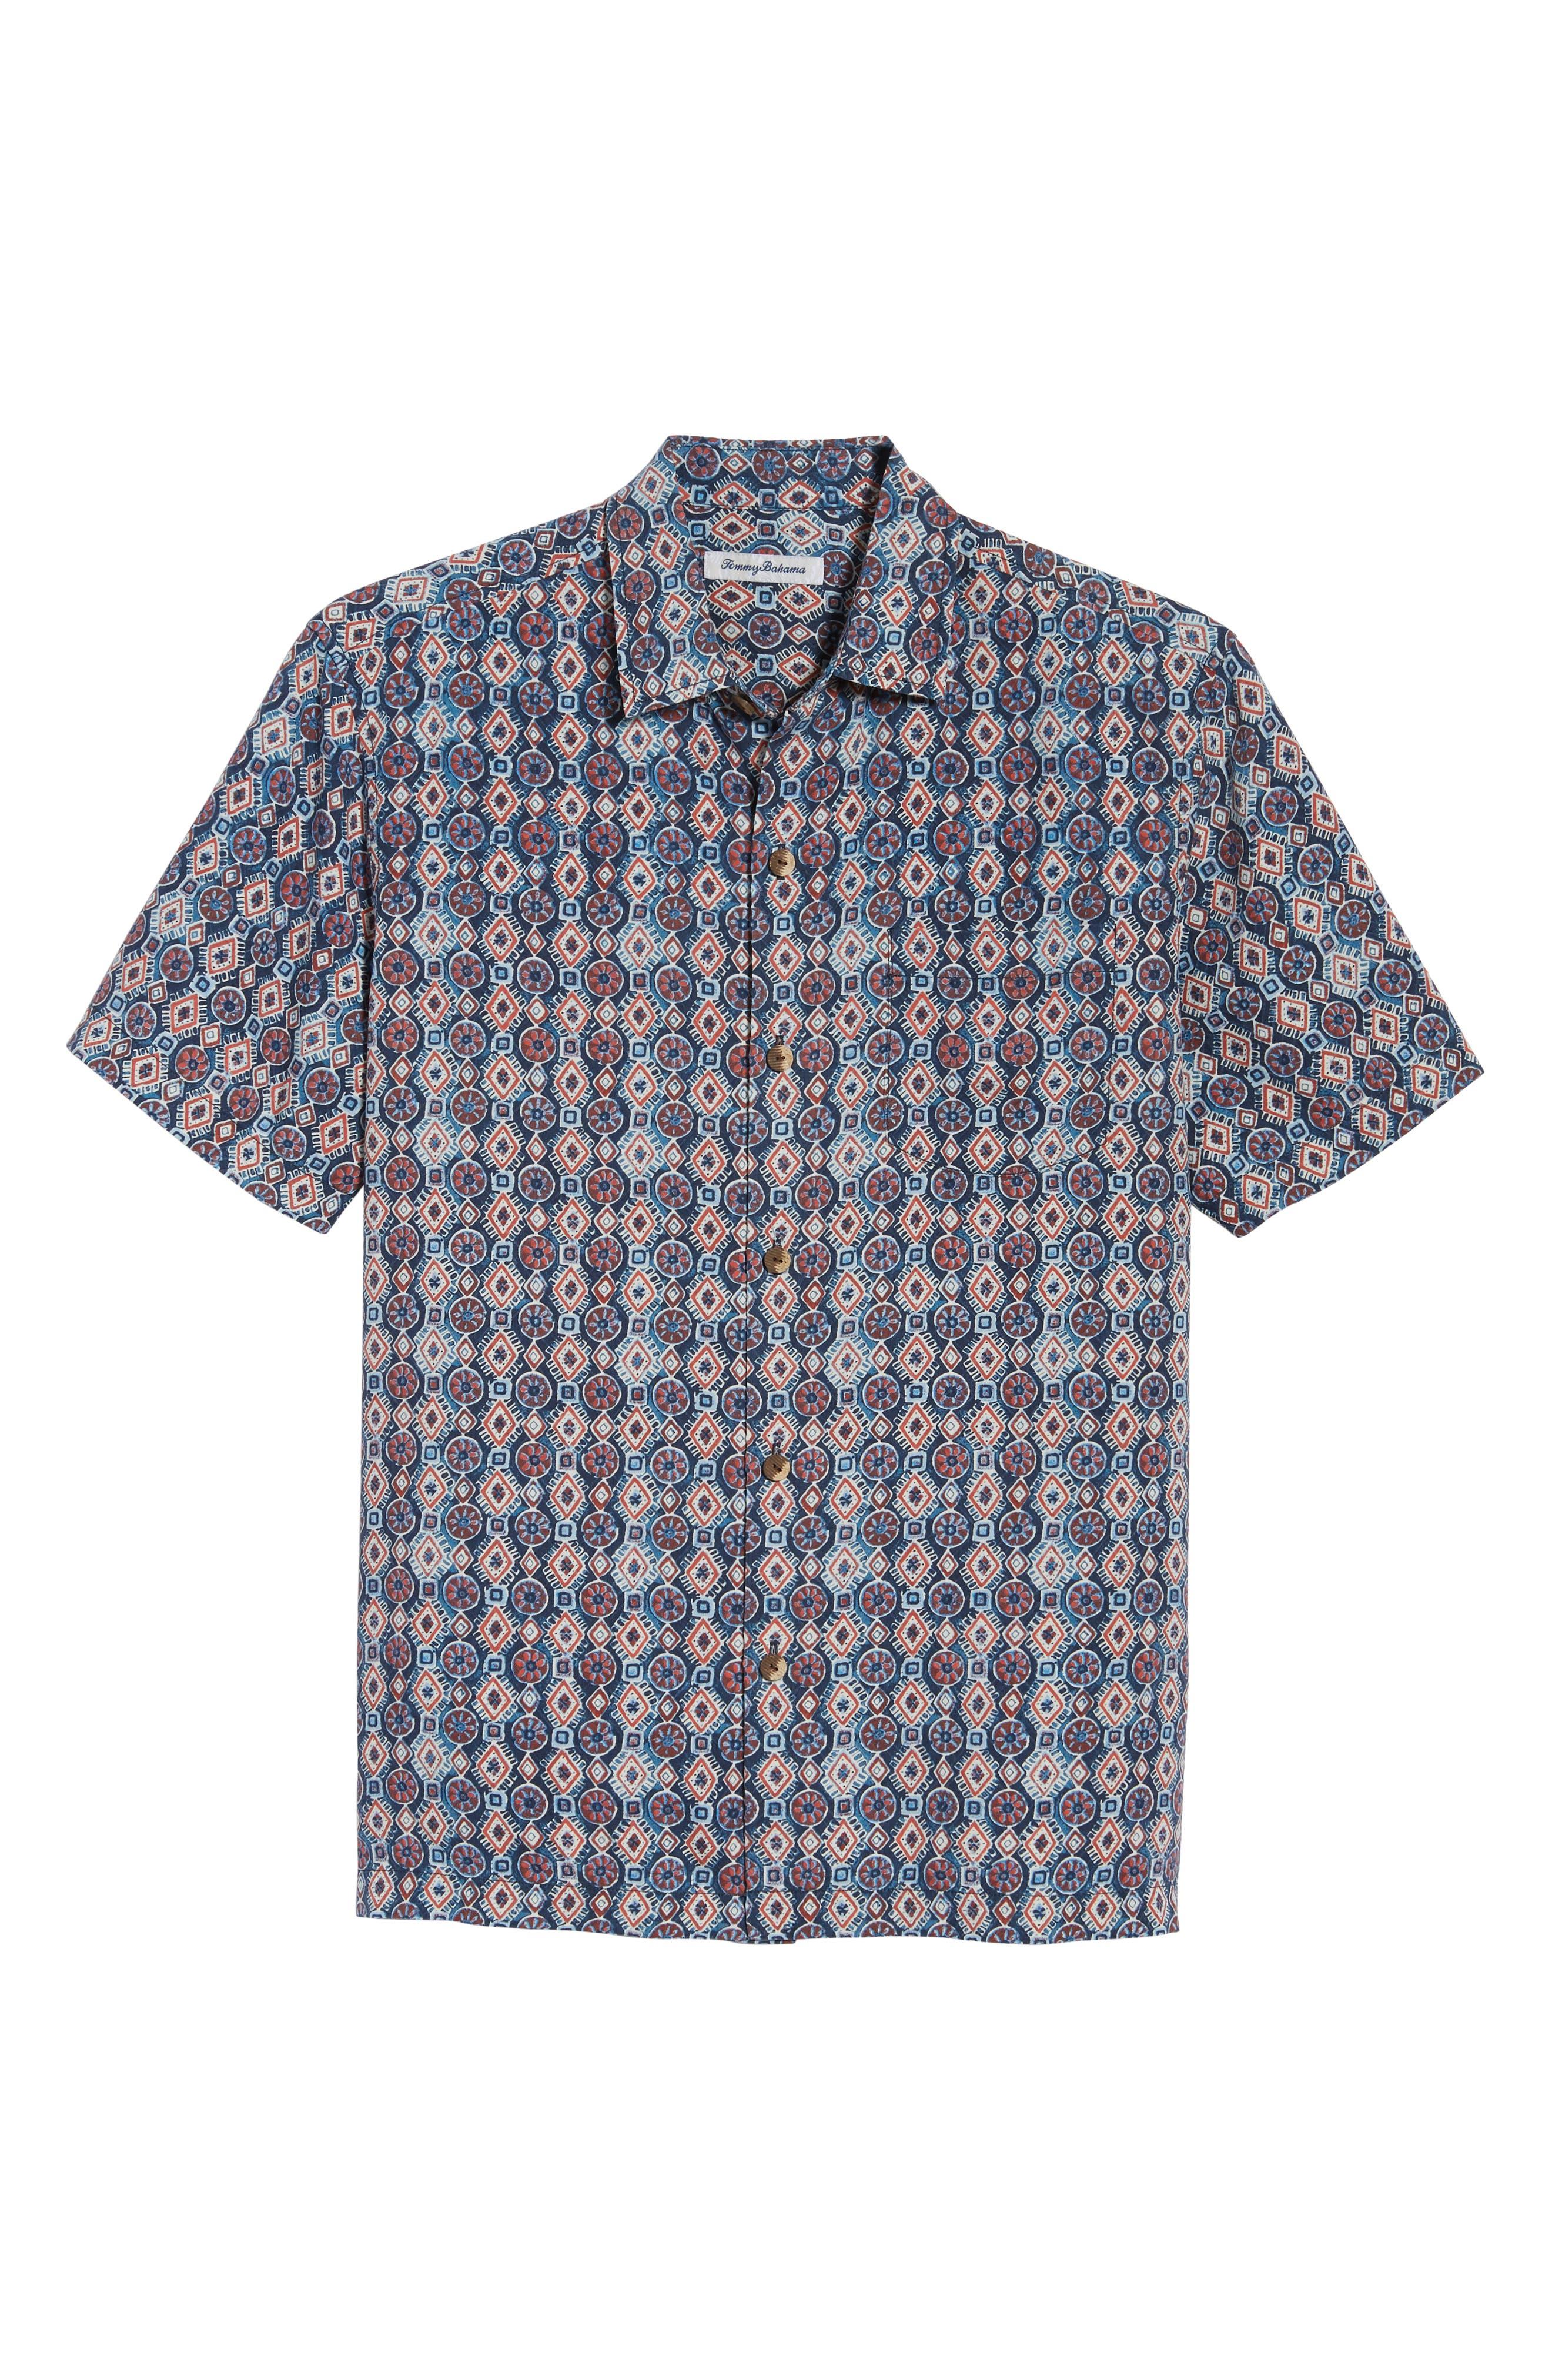 TOMMY BAHAMA,                             Tulum Tiles Silk Camp Shirt,                             Alternate thumbnail 6, color,                             400